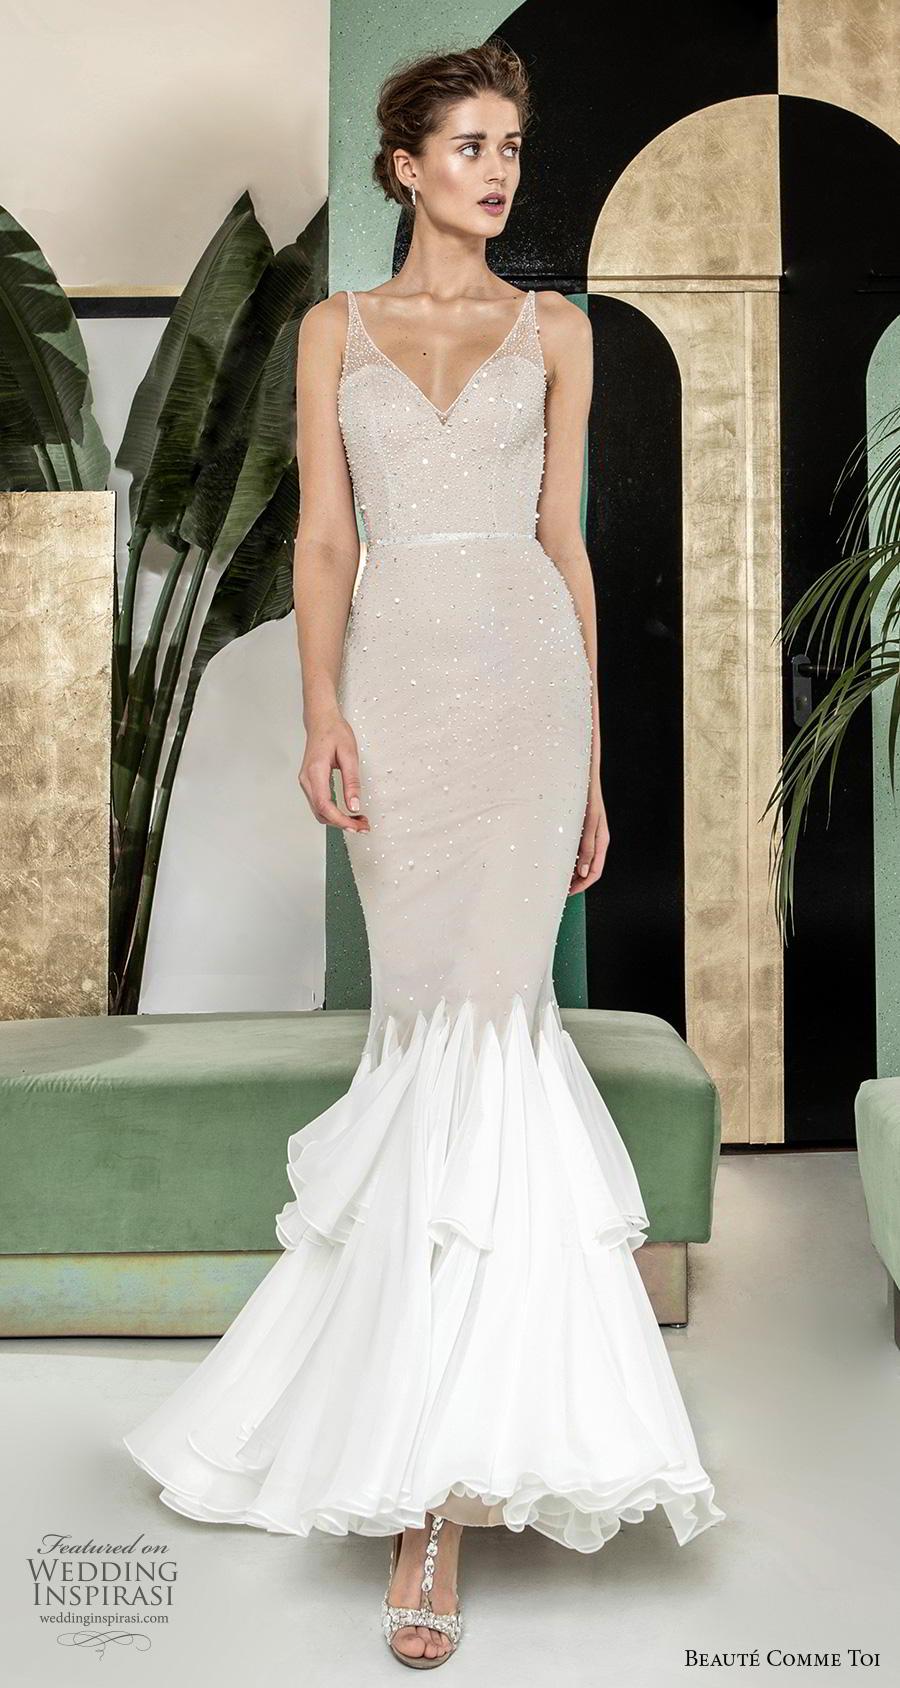 beaute comme toi 2019 bridal sleeveless with strap illusion v sweetheart neckline heavily embellished bodice glitter elegant mermaid wedding dress (mirianna) mv